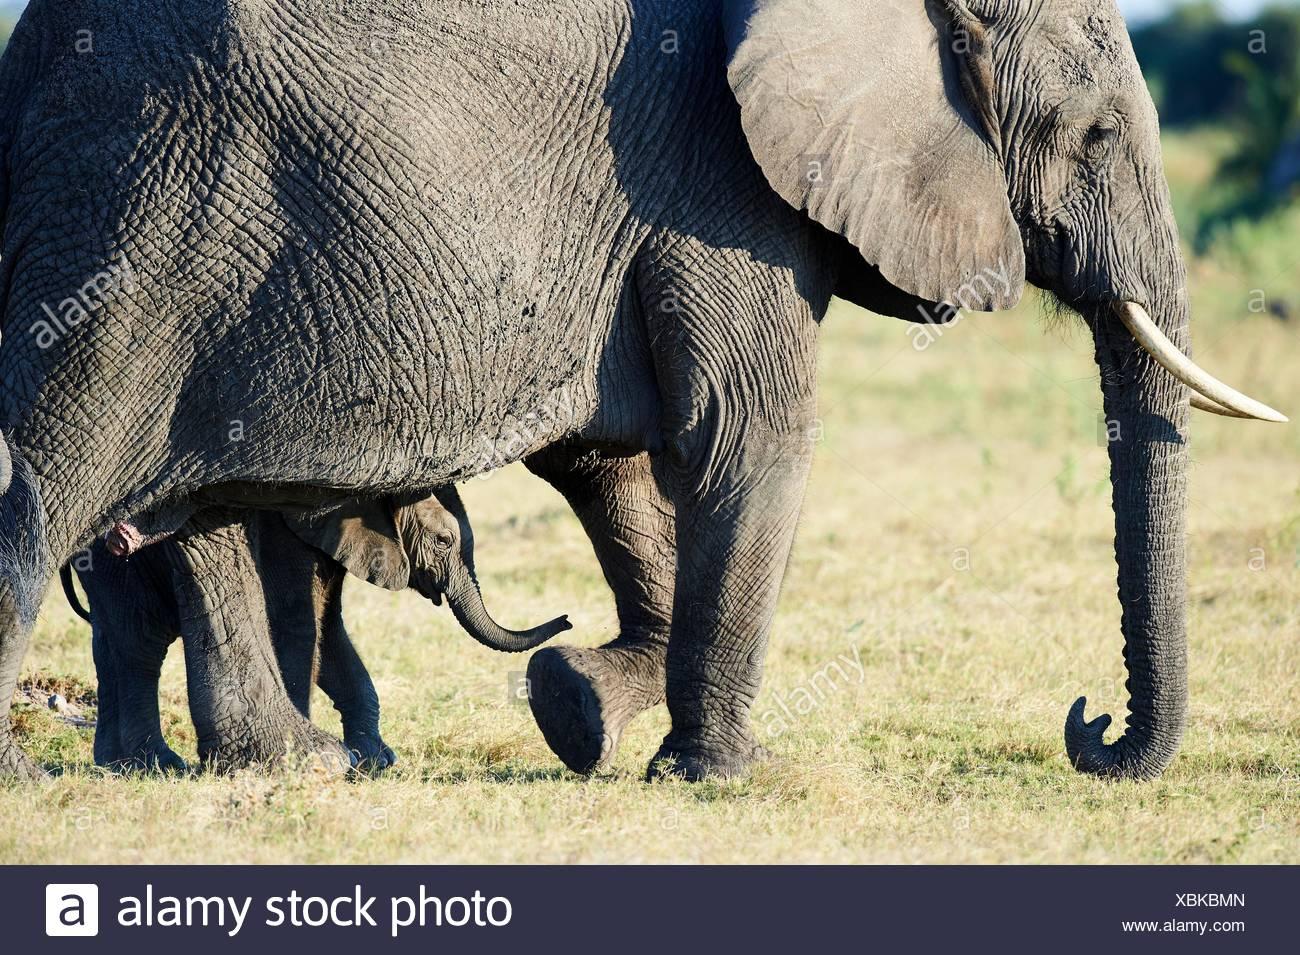 Elefante africano madre e i giovani vitelli (Loxodonta africana), Duba Plains, Okavango Delta, Botswana, Sud Africa. Immagini Stock